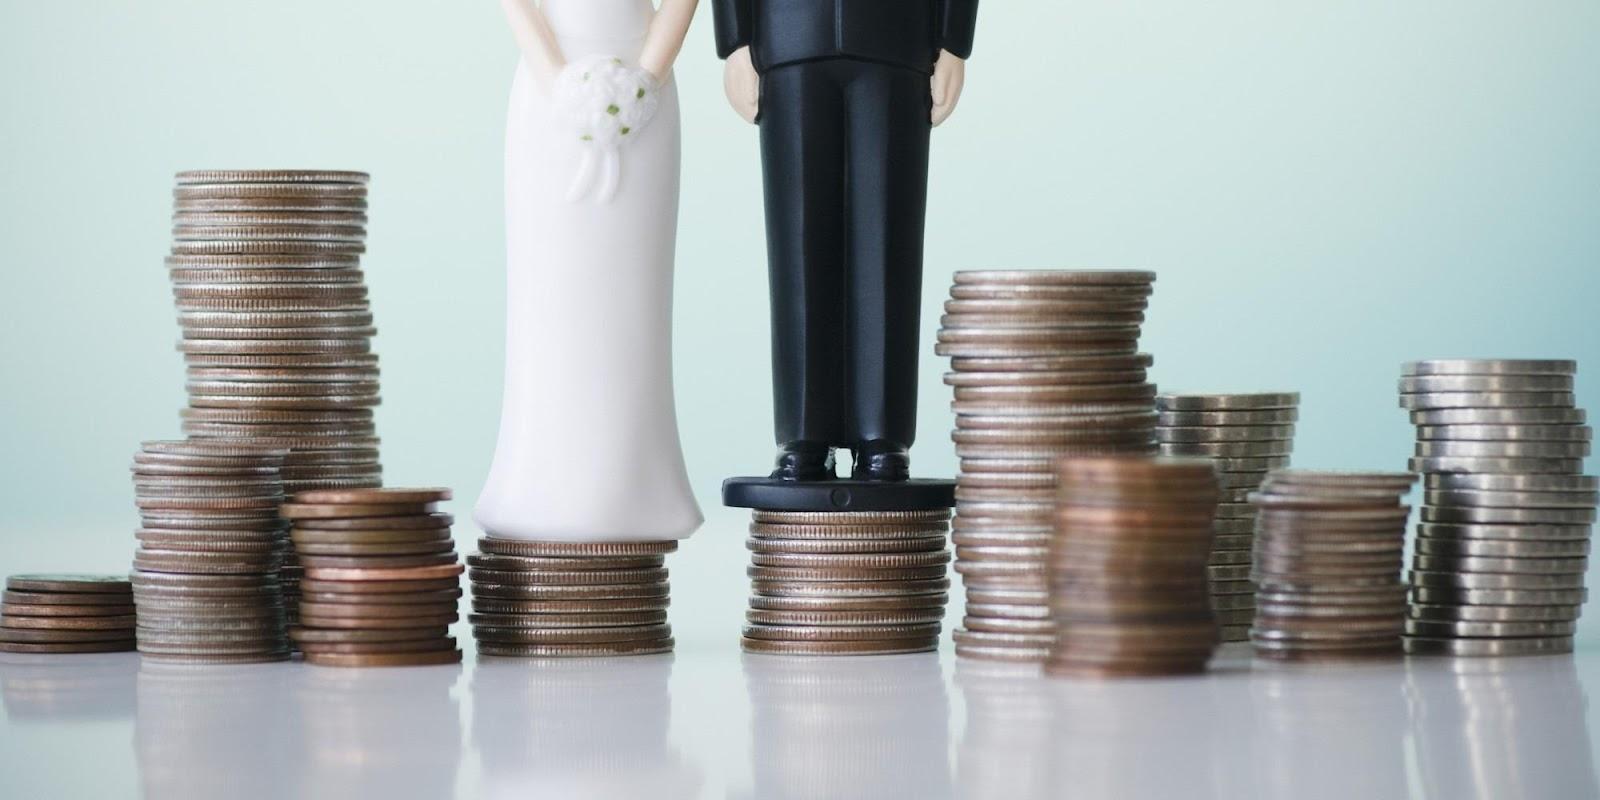 https://www.google.co.in/search?q=budgeting+for+a+wedding&tbm=isch&tbs=simg:CAQSlQEJTejx5nDi1I4aiQELEKjU2AQaAggVDAsQsIynCBpiCmAIAxIomwHRBYsBmgGCAaEHjBjFEIgNgQTuJ_1AnxDWuNuIn3yfDNe8n9jWQPhowLp9tfRukEAgPSvQGbPoeoTNCt6PPIiFcu58-11BtEicOrrI1QzlqpaOnDMTg6OnnIAQMCxCOrv4IGgoKCAgBEgRrInVADA&sa=X&ved=0ahUKEwjp0YzEk_rgAhUGWX0KHeWFBA8Q2A4ILCgB&biw=1360&bih=608#imgrc=VKva9sHrnfDTRM: